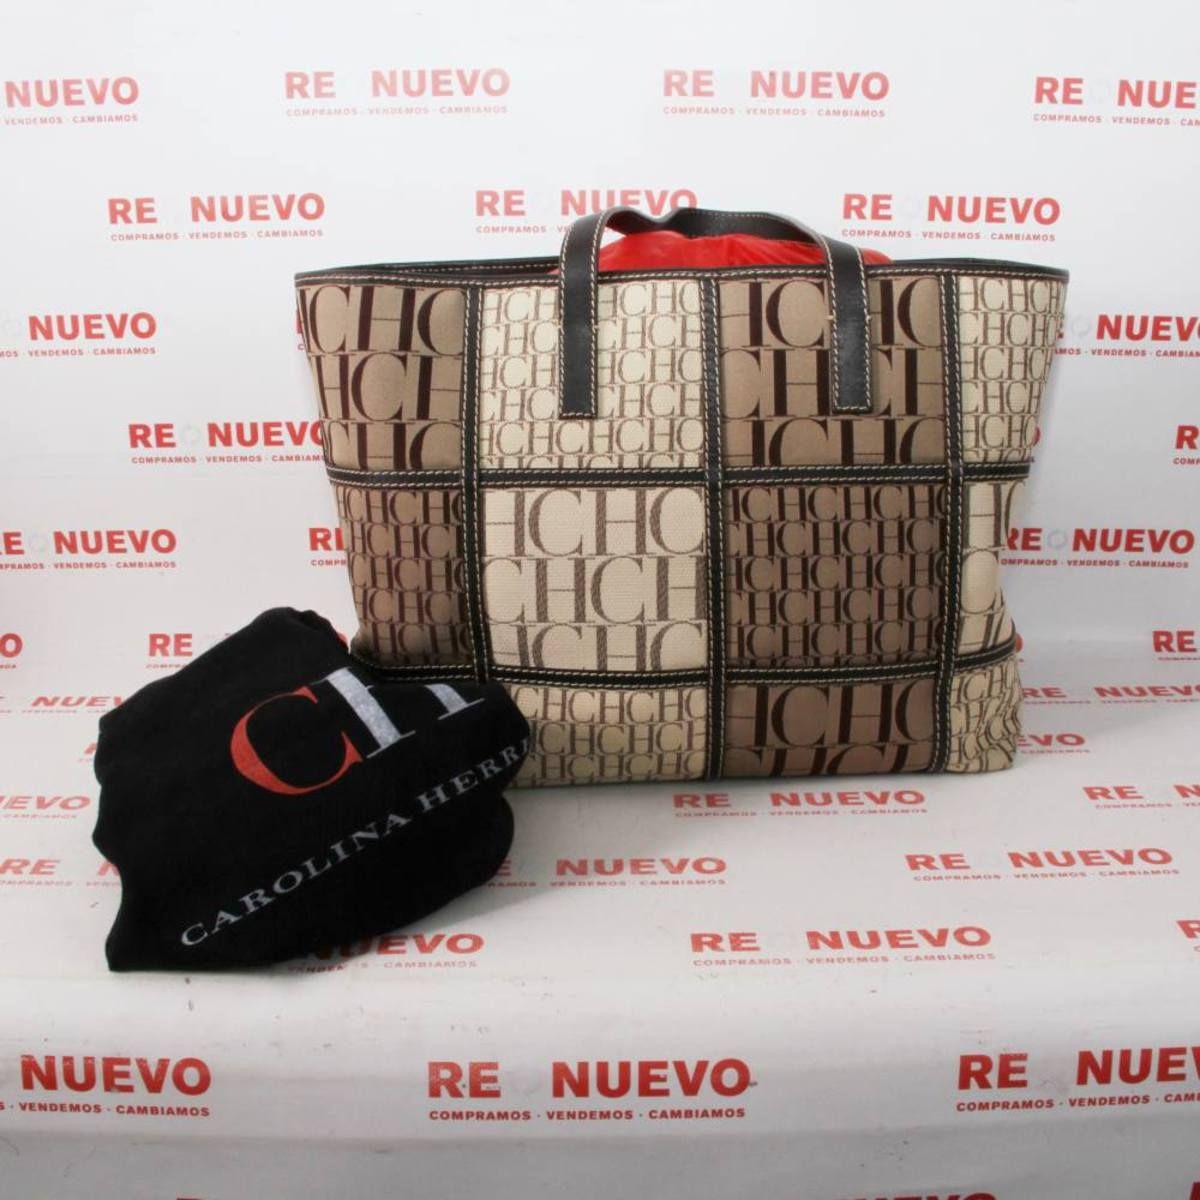 incomparable excepcional gama de estilos moderno y elegante en moda Comprar Bolso CAROLINA HERRERA SHOPPING PATCHWORK de segunda ...